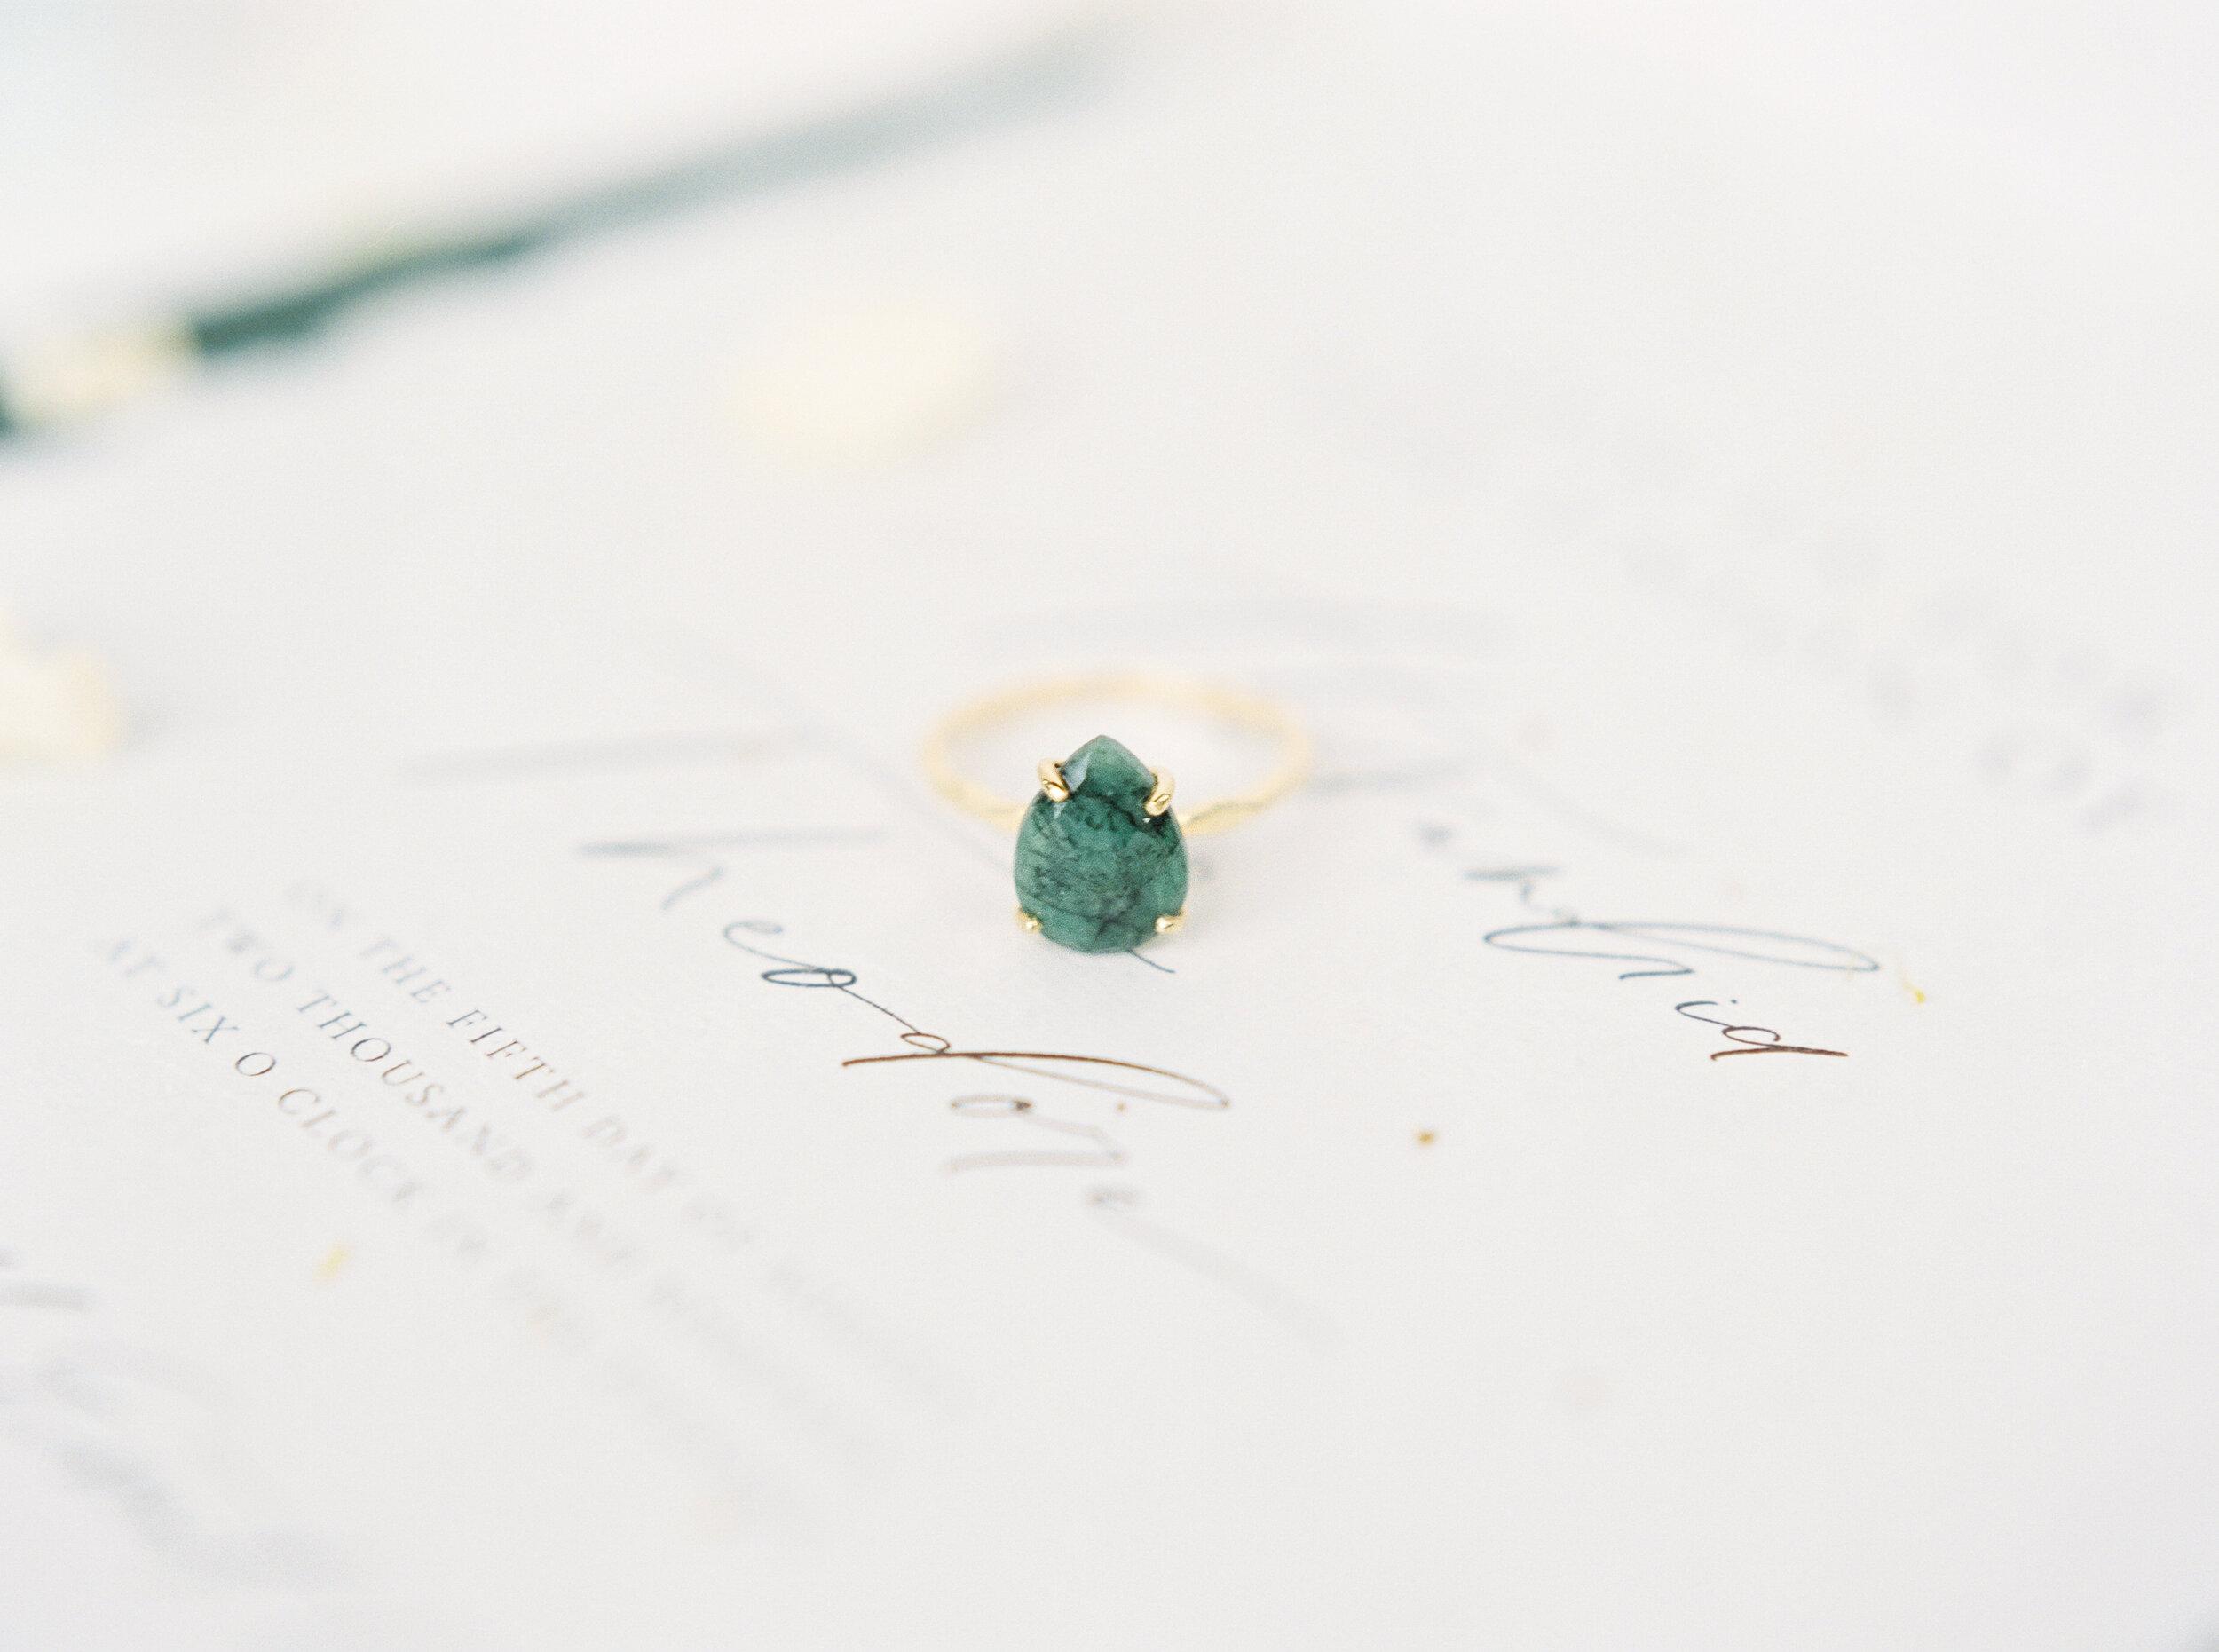 Bibb_Mill_Wedding_Editorial_Columbus_Georgia_Fallen_Photography_2-52.JPG